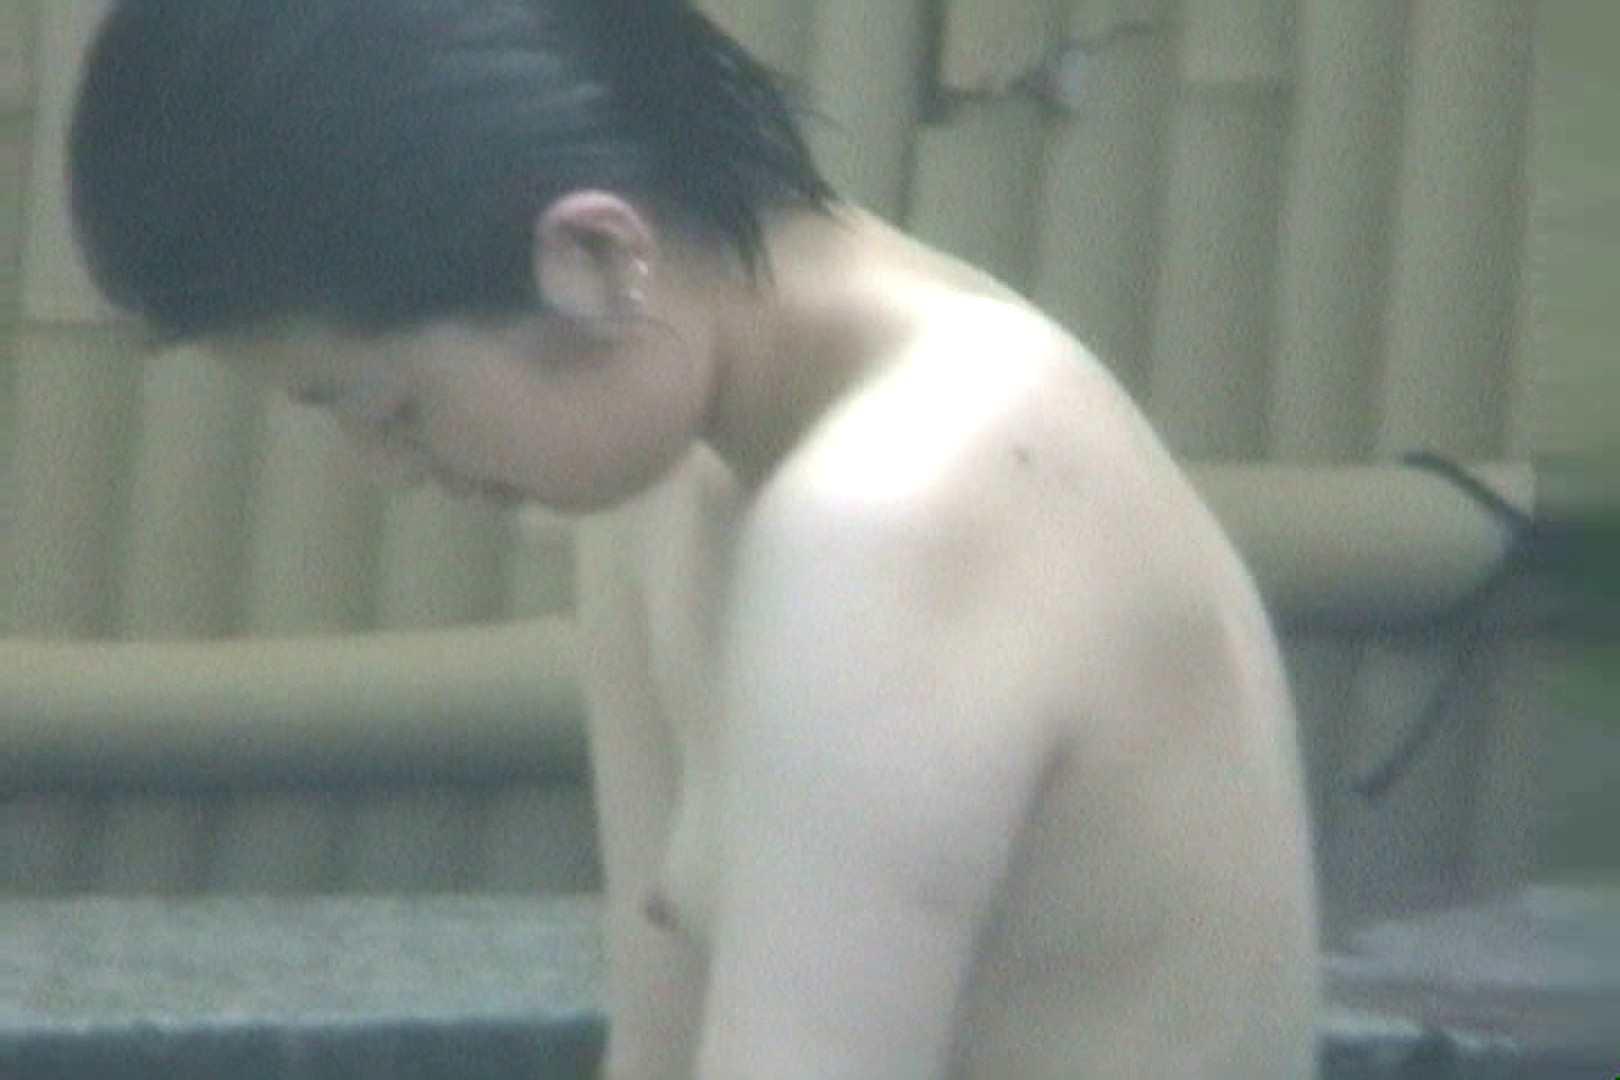 Aquaな露天風呂Vol.105 露天風呂編  87PIX 56